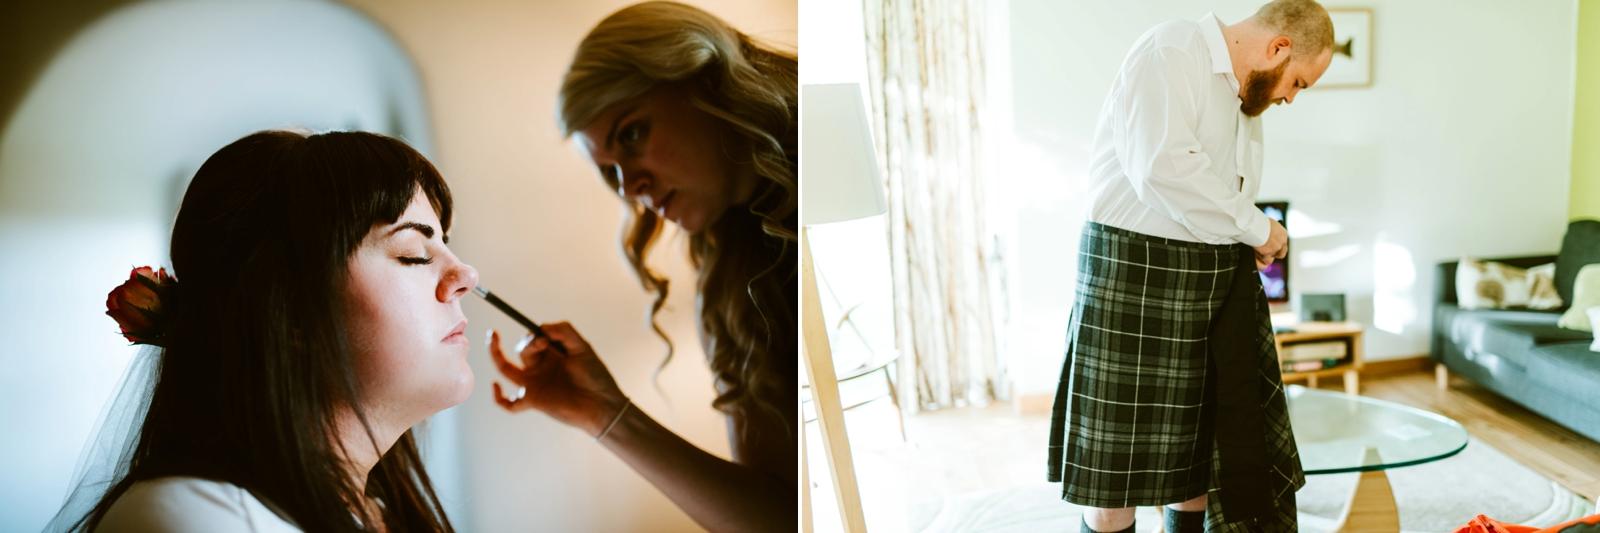 alternative-wedding-photography-scotland-katie-stephen-aikwood-tower-23.jpg